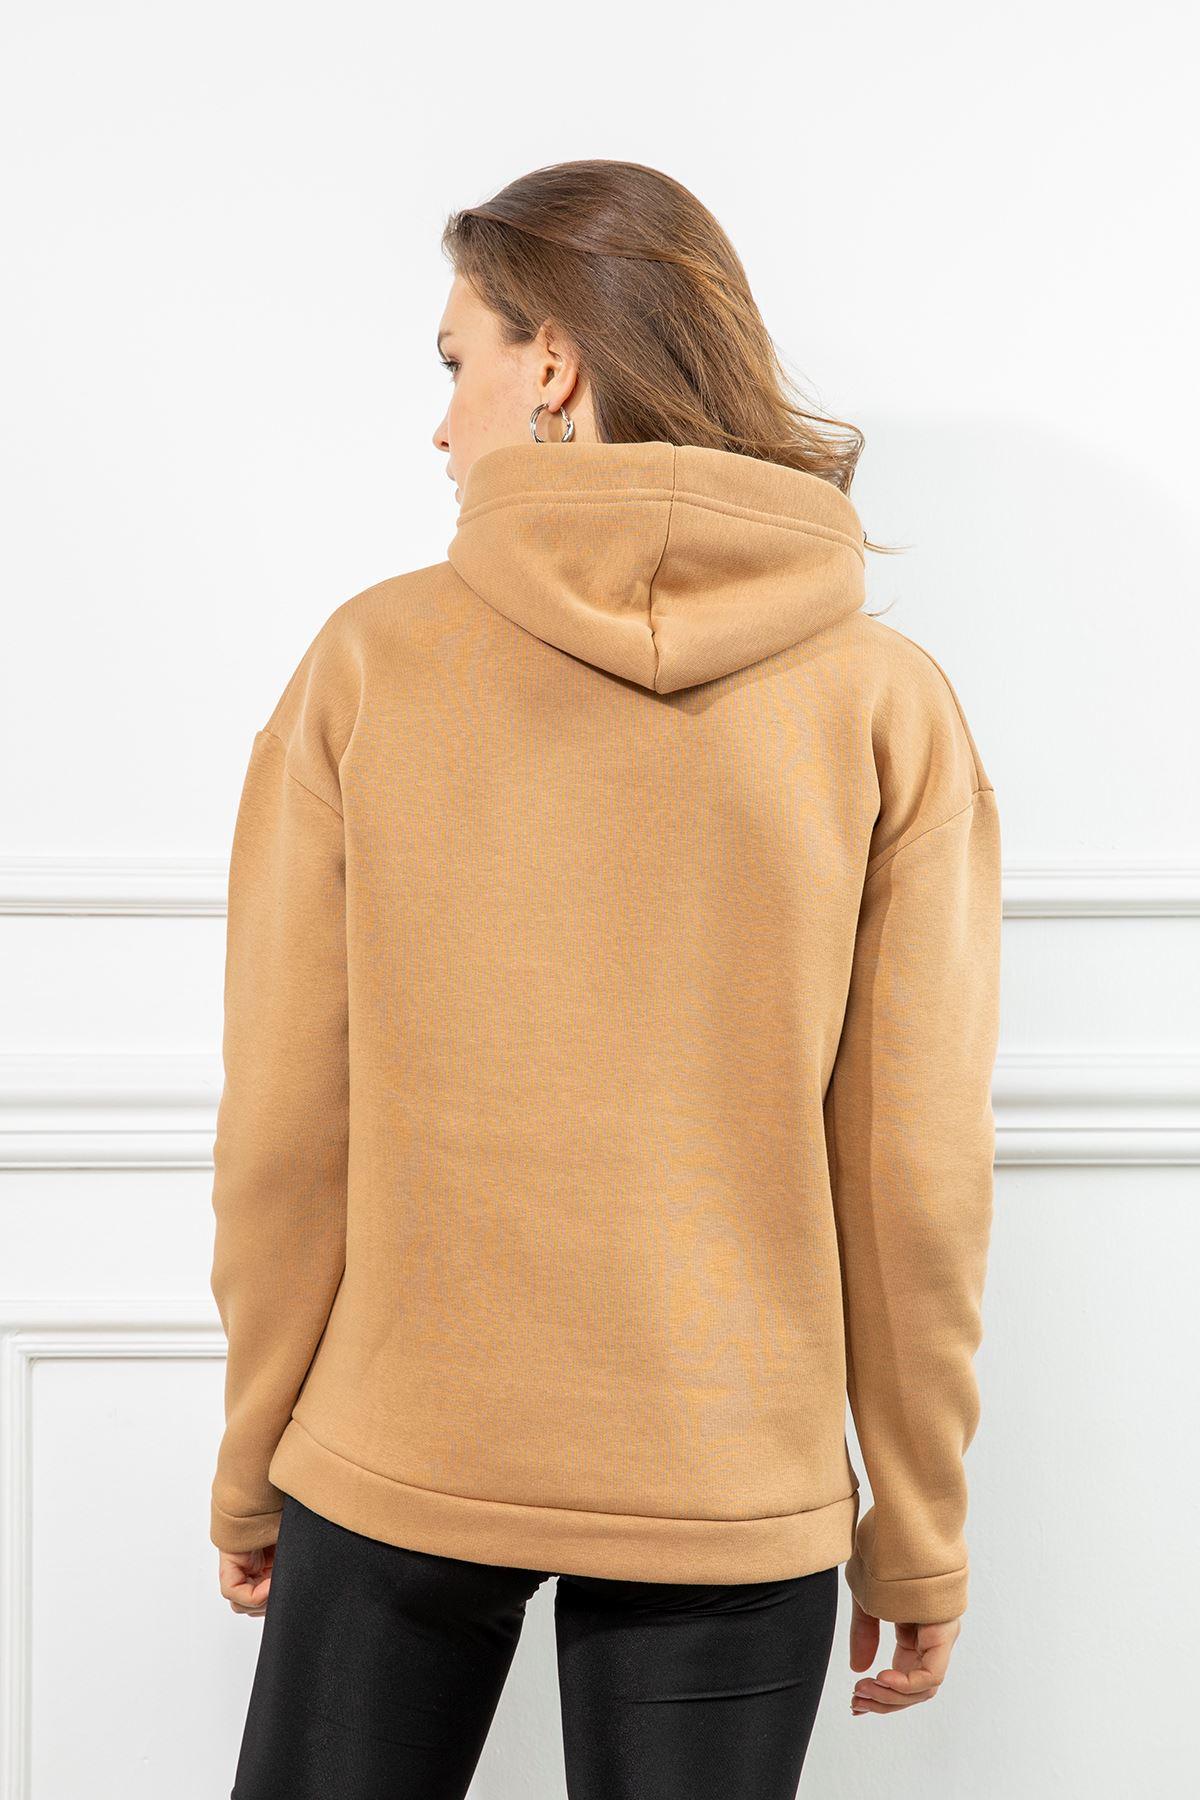 Cepli Sweathirst-Camel